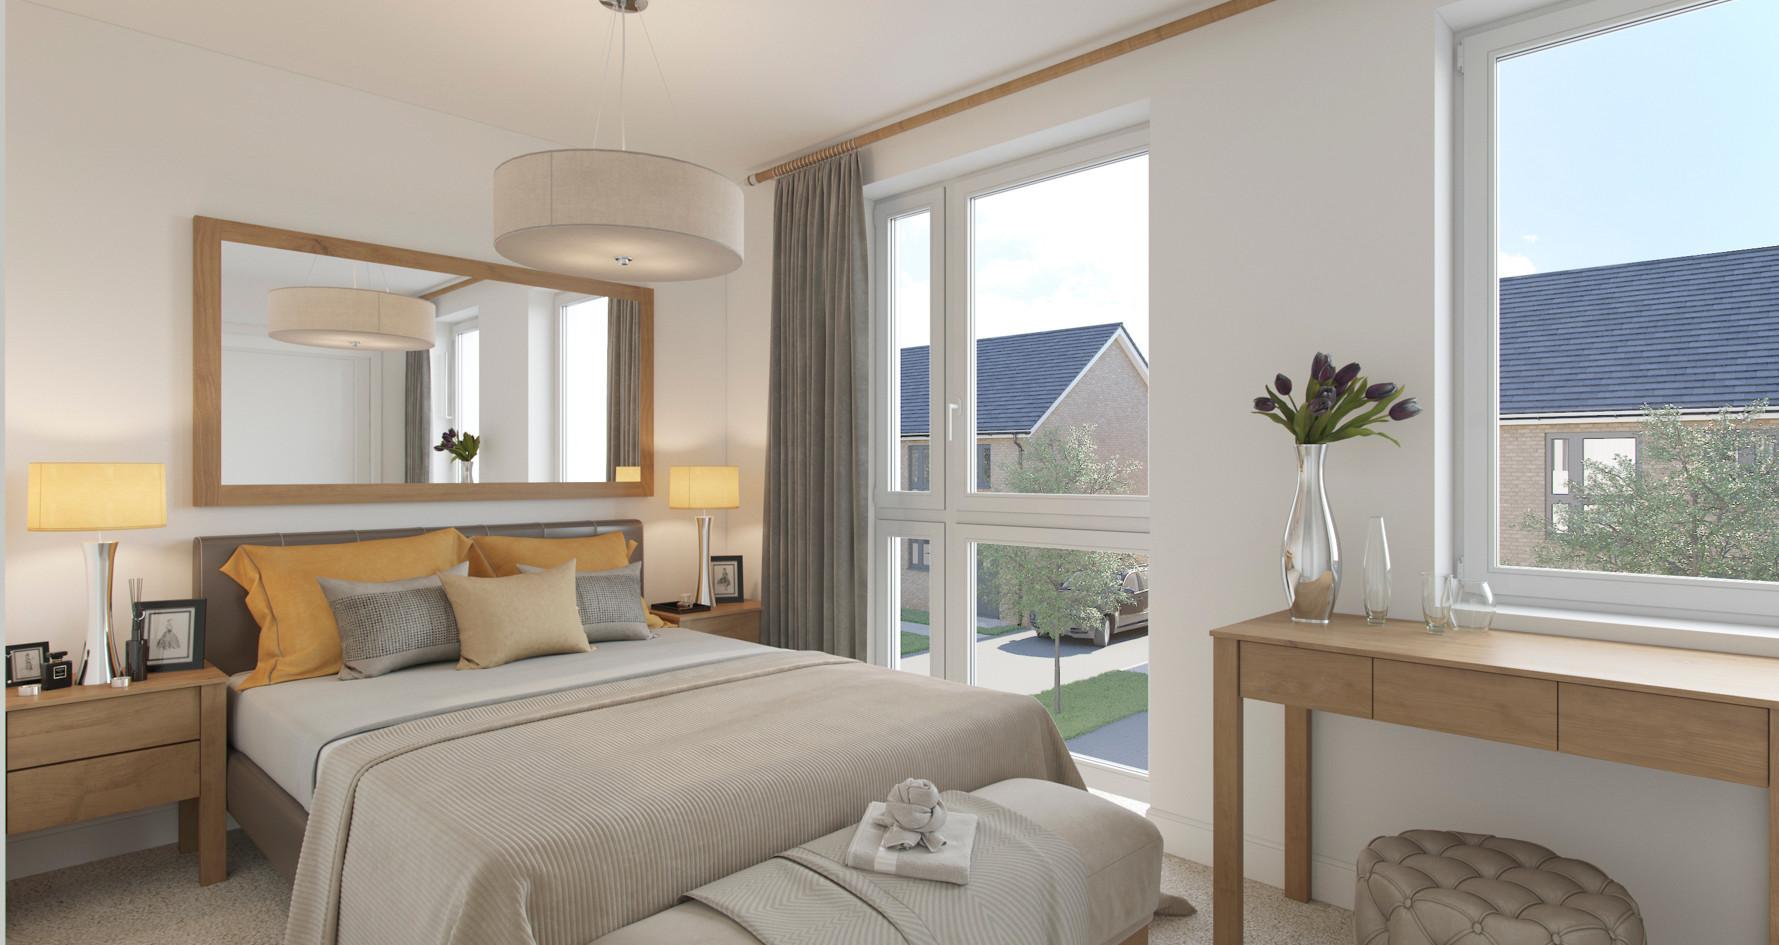 Cambourne CGI - Bedroom_1.JPG